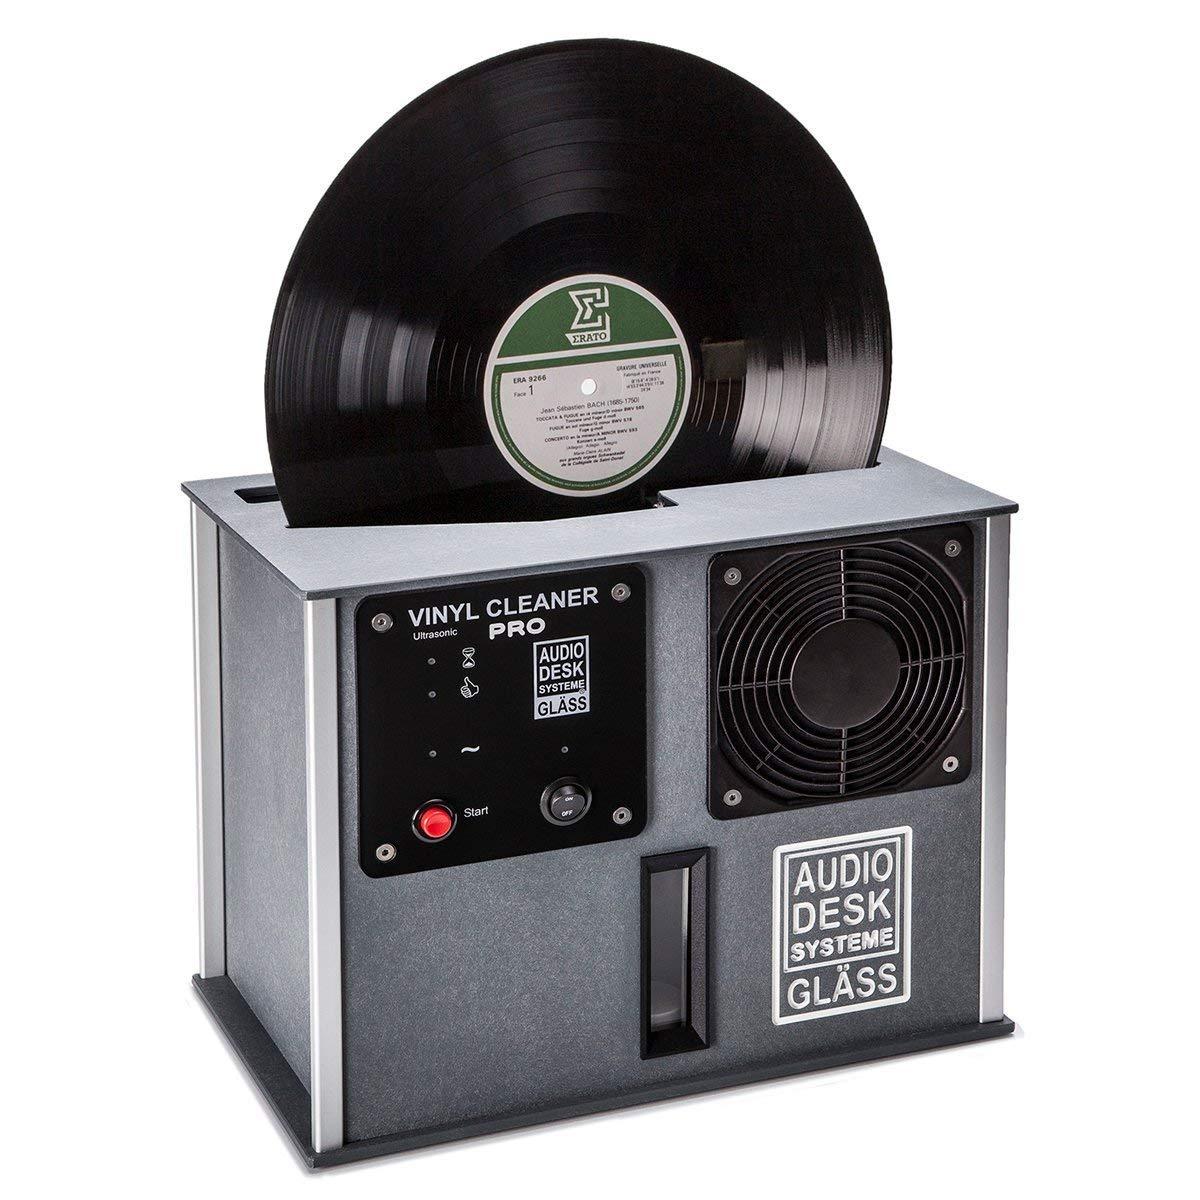 Audio Desk Systeme Premium Ultrasonic Vinyl Cleaner PRO